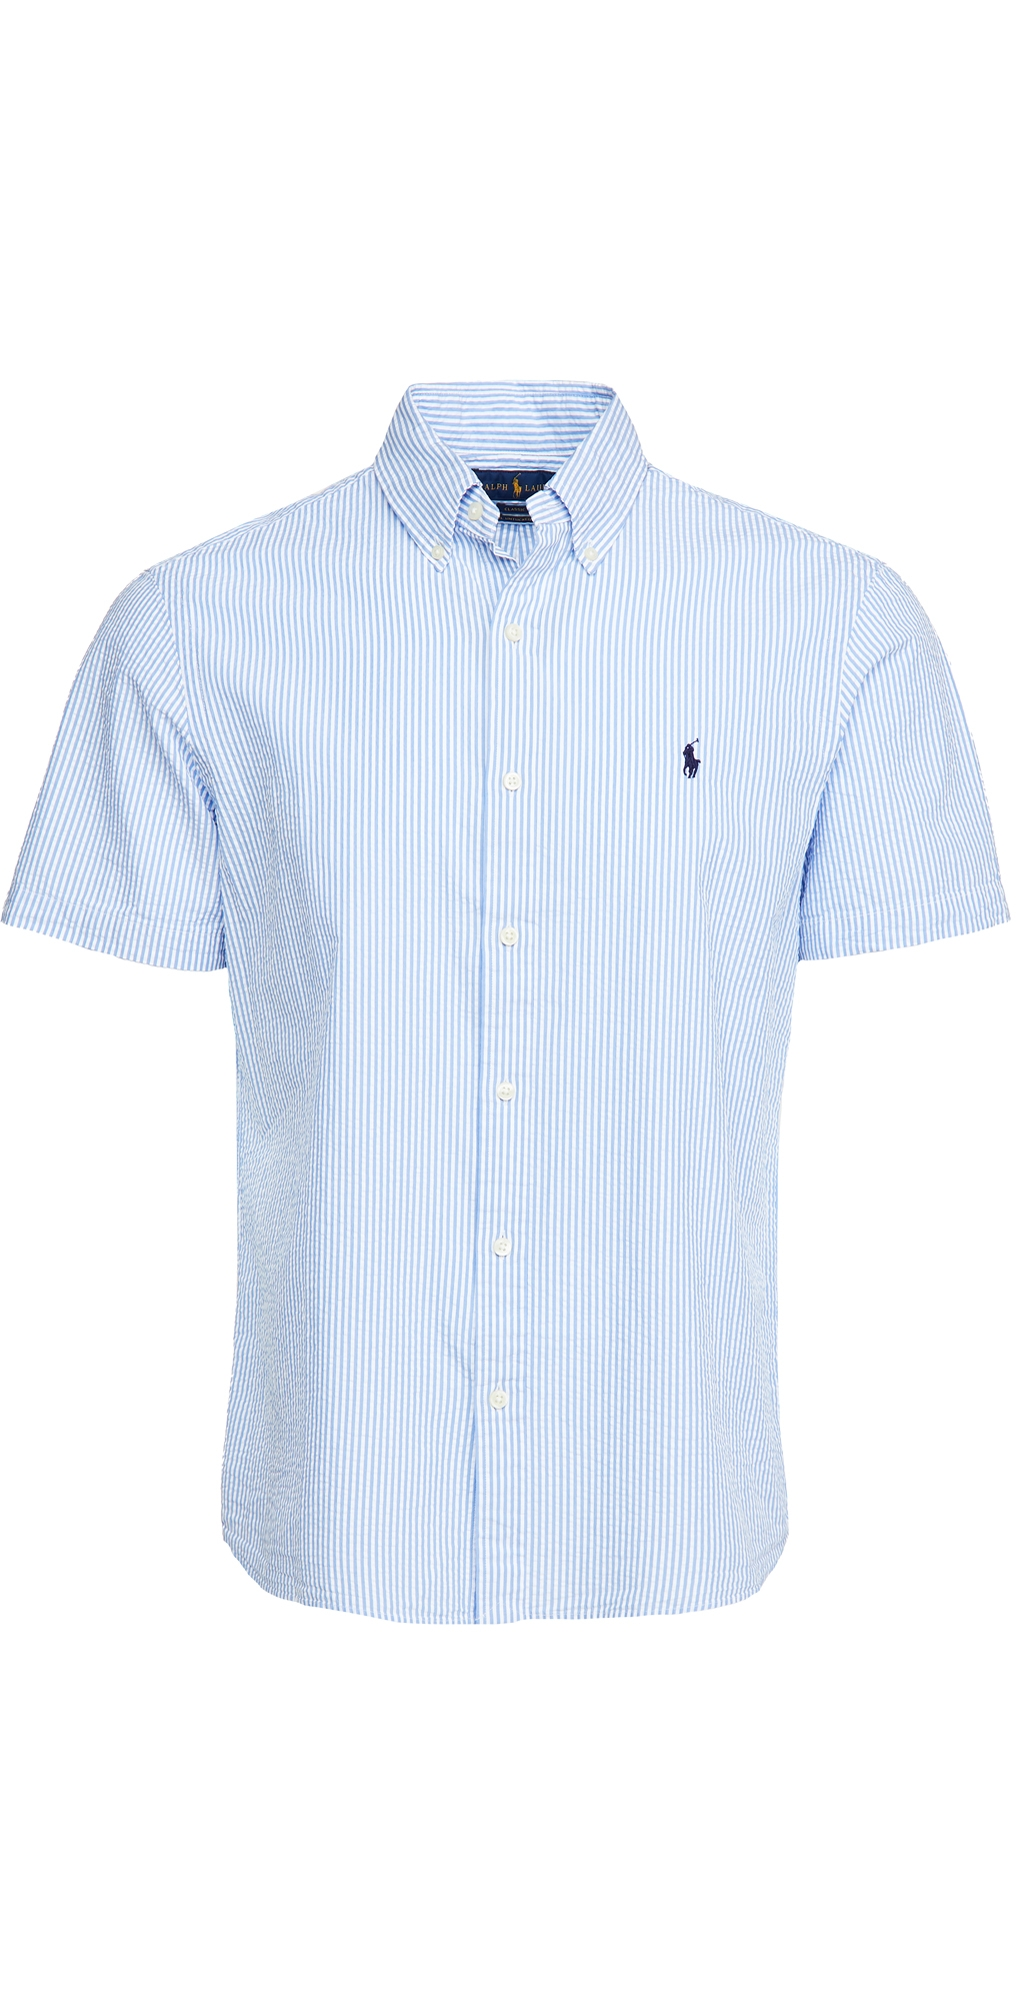 Polo Ralph Lauren Short Sleeve Seersucker Shirt